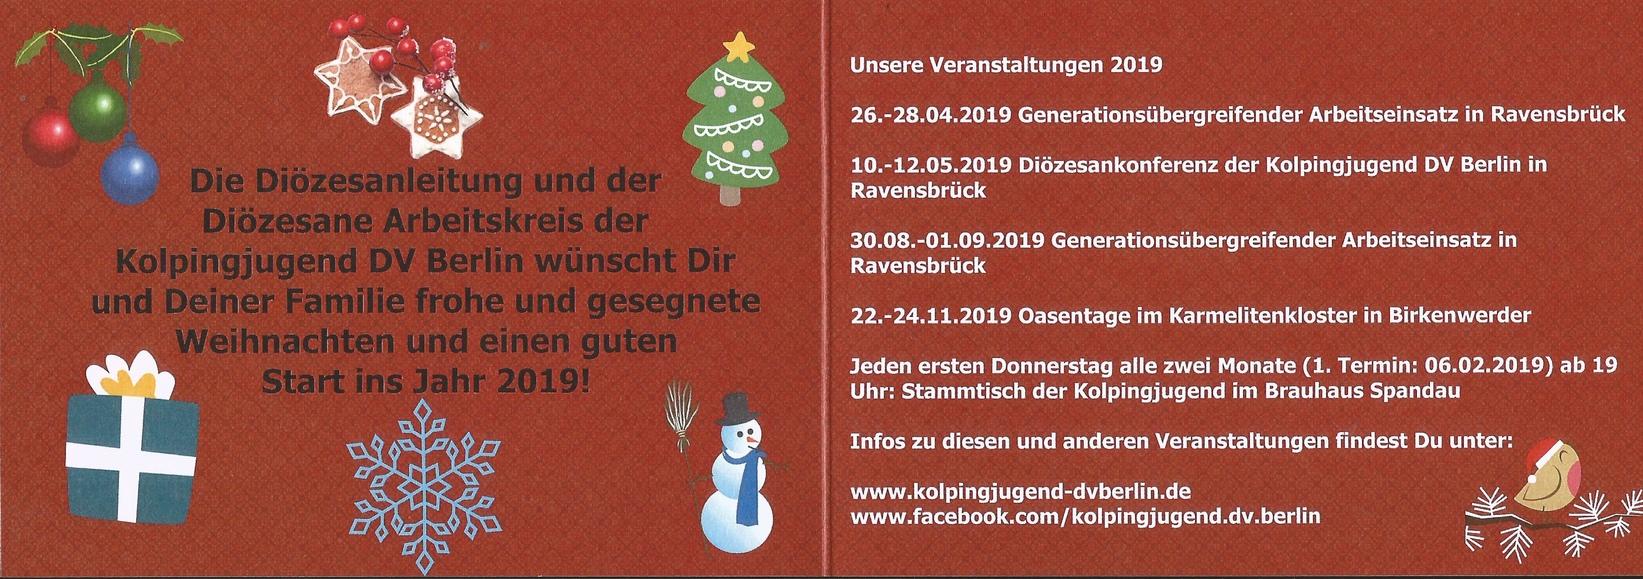 Frohe Weihnachten Berlin.Frohe Weihnachten Kolpingjugend Dv Berlin